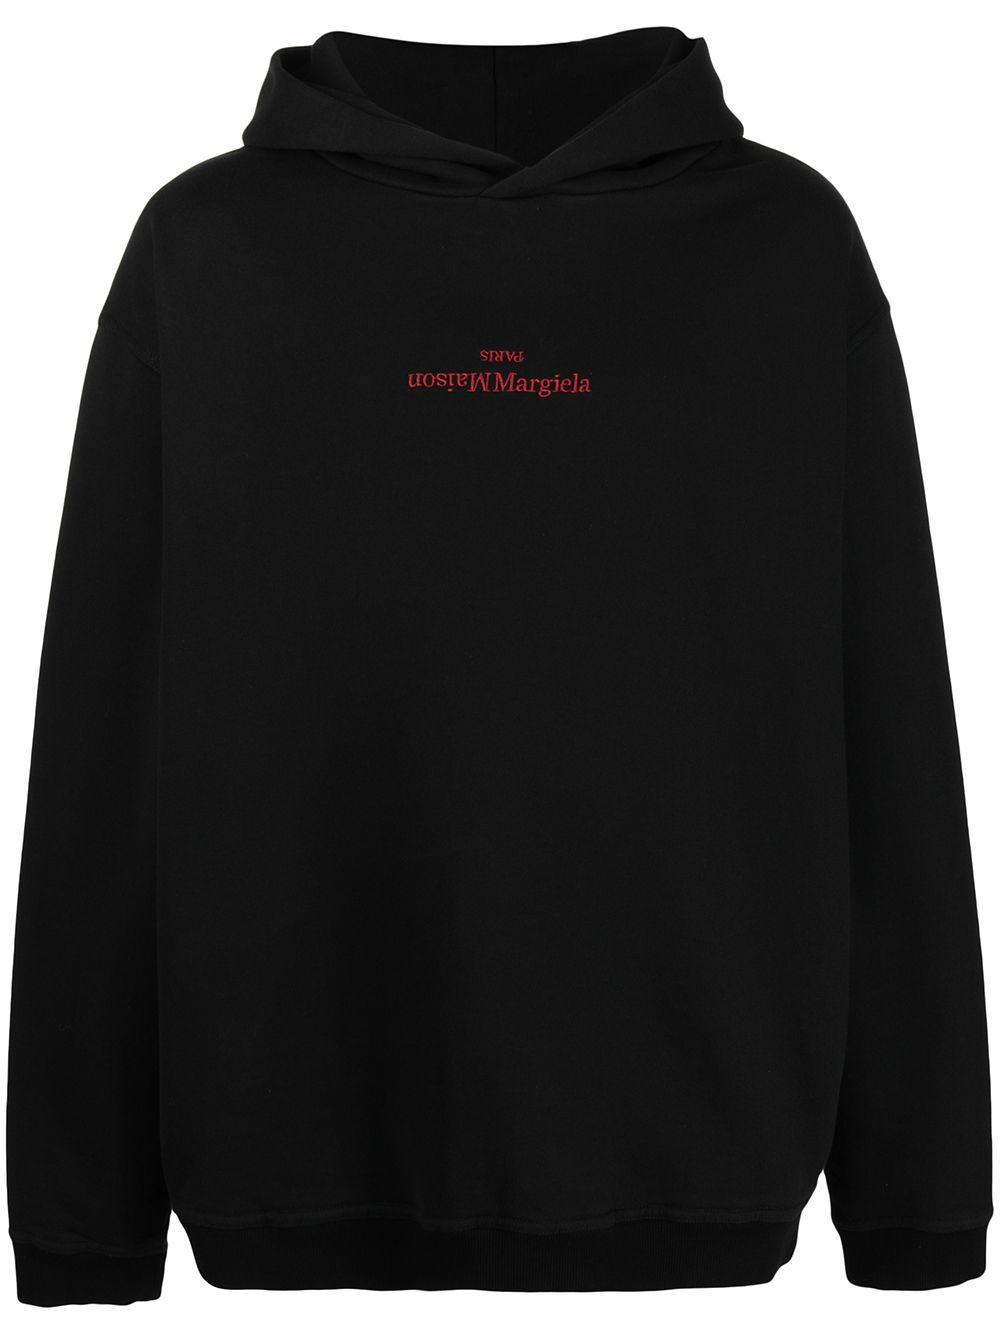 LOGO HOODIE MAISON MARGIELA   Sweatshirts   S50GU0167 S25503900